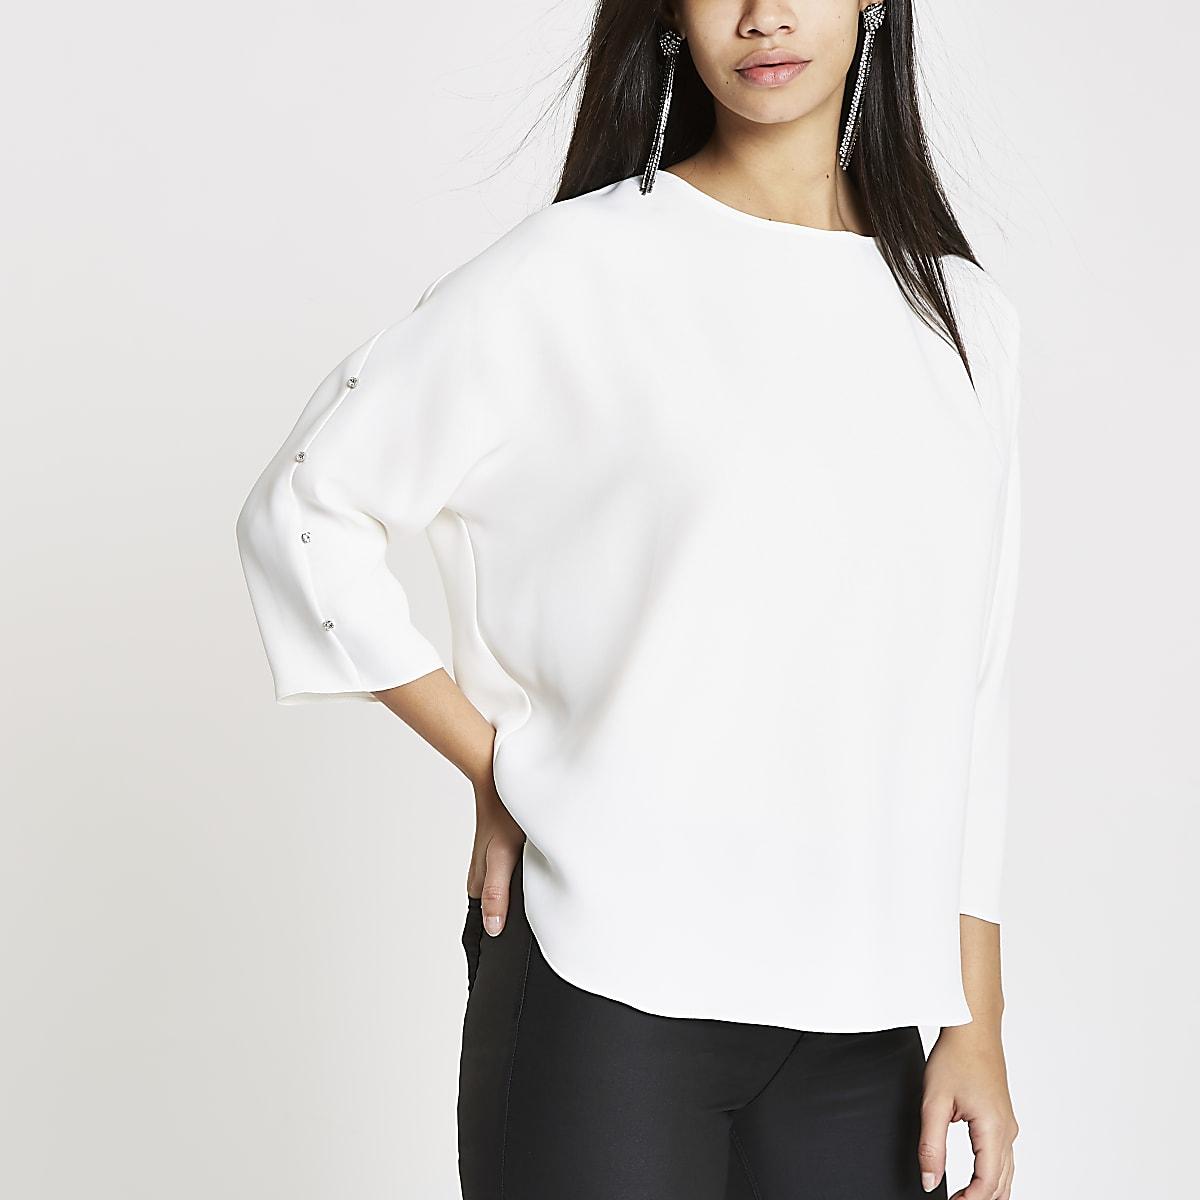 White loose fit rhinestone batwing top